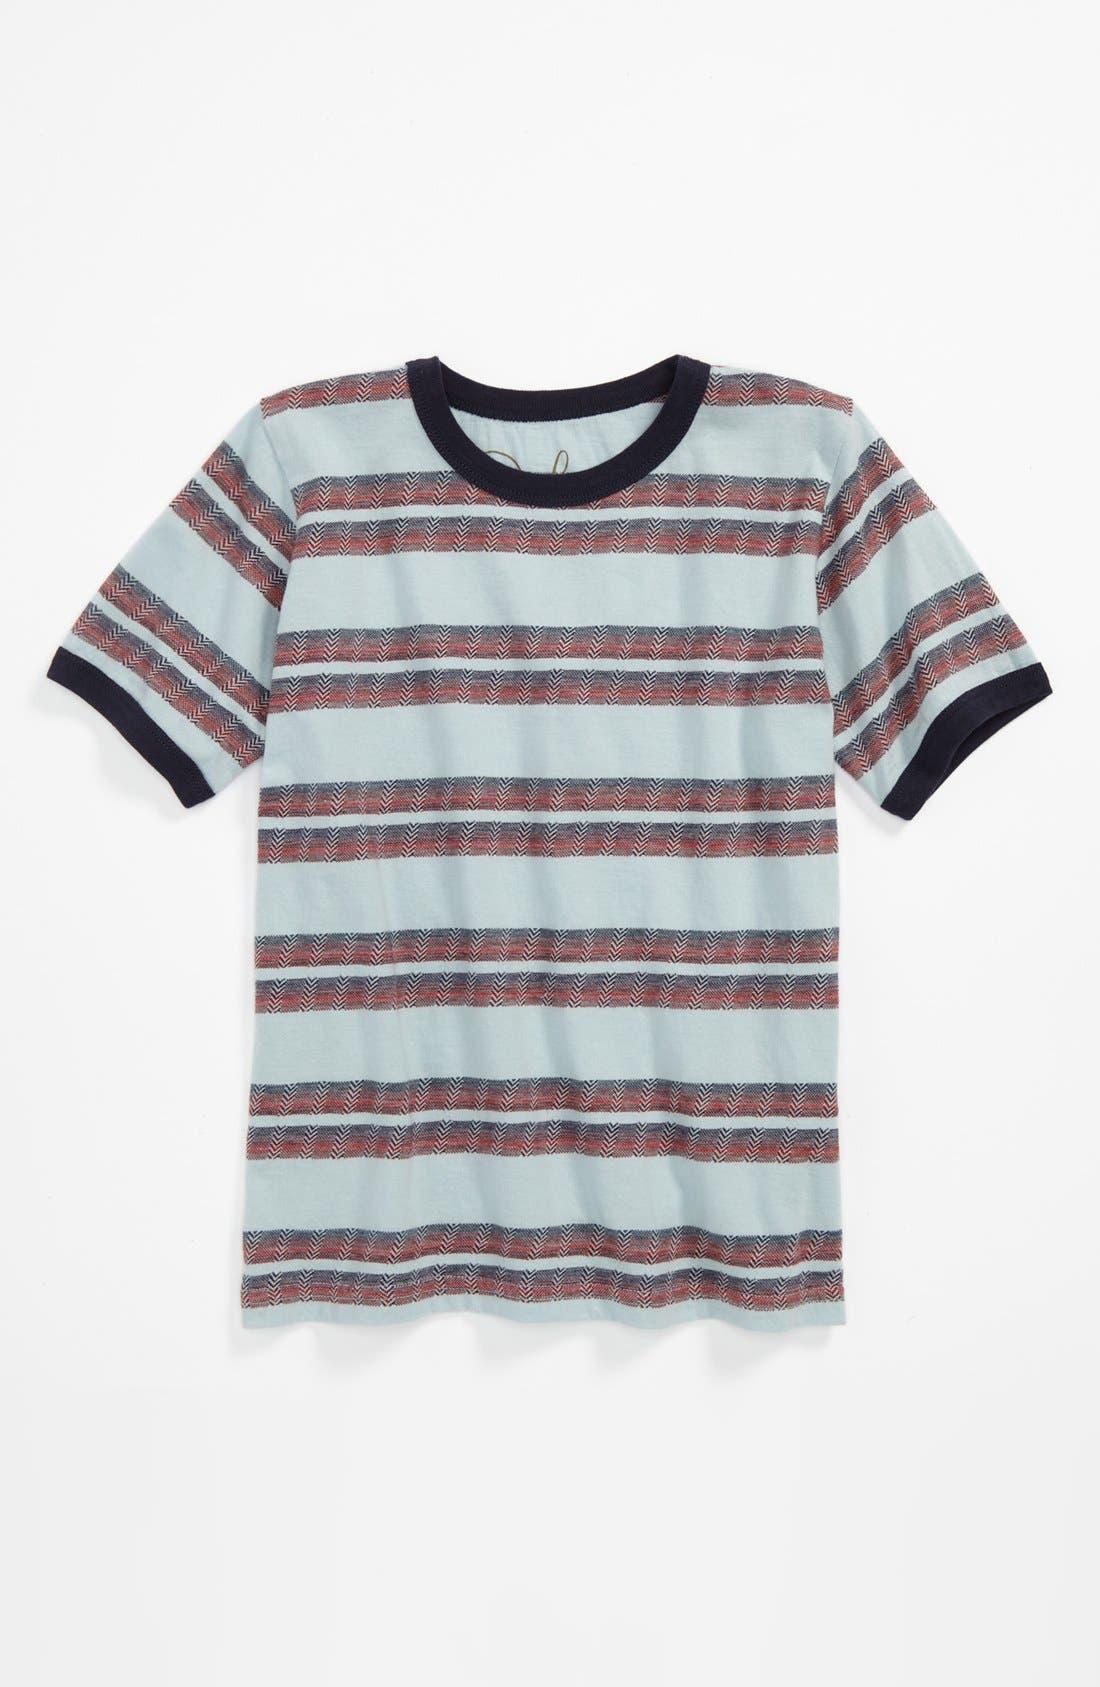 Alternate Image 1 Selected - Peek 'Mateo' T-Shirt (Toddler Boys &  Little Boys)